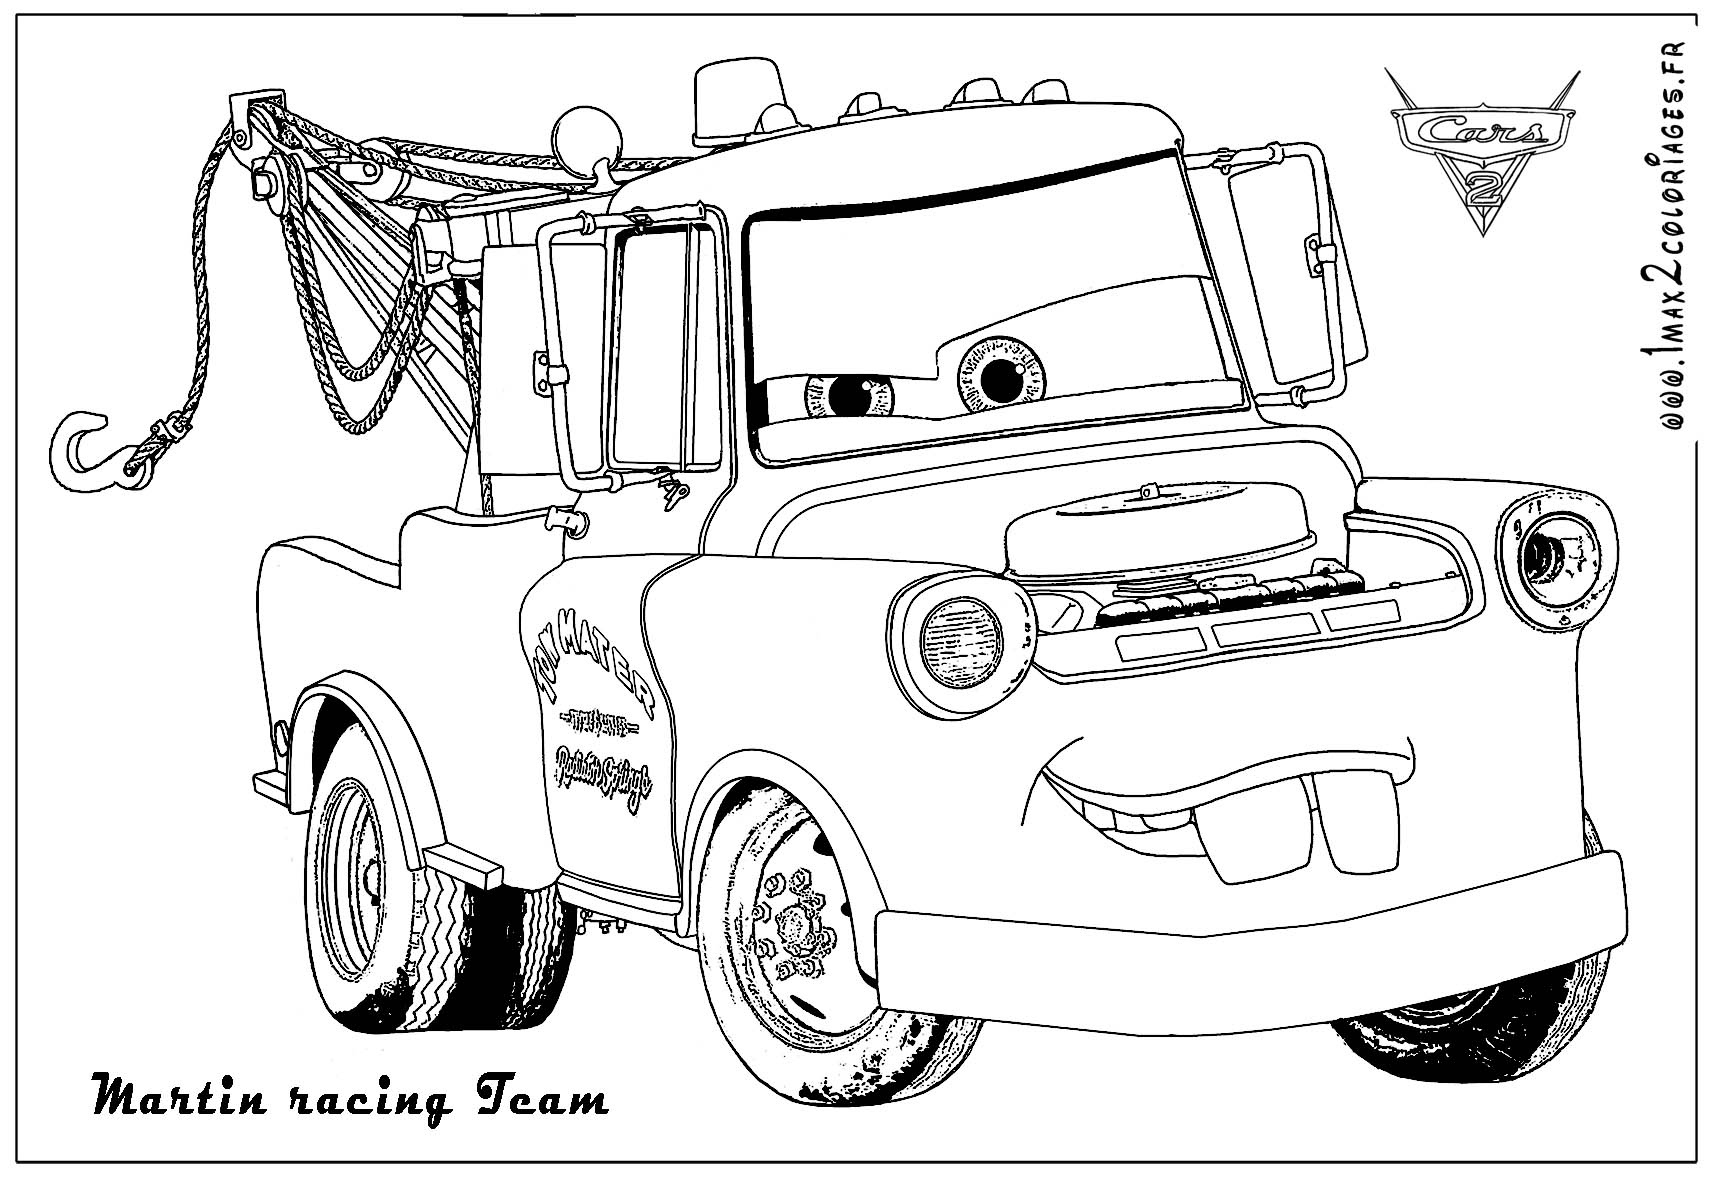 Coloriages Cars 2 - Martin Racing Team - Coloriages Les encequiconcerne Coloriage Flash Mcqueen